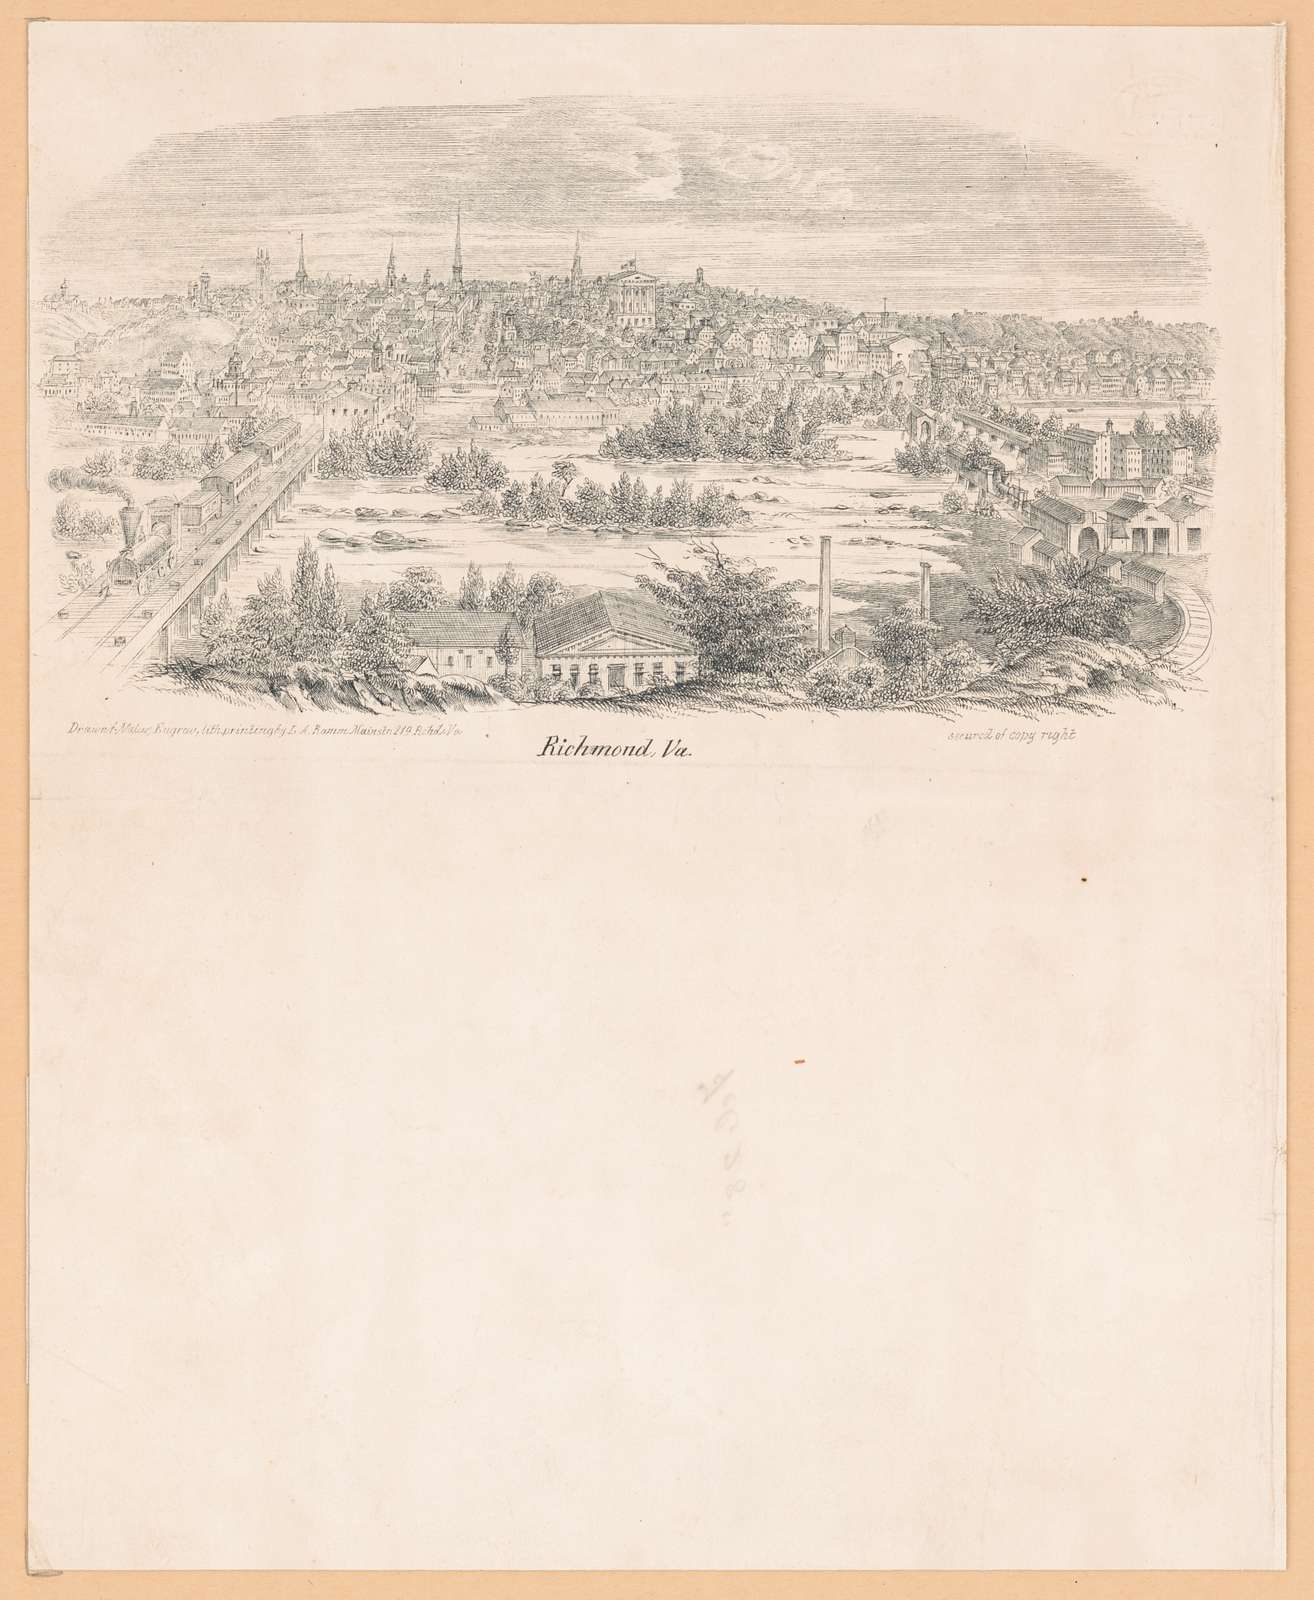 Richmond, Va. drawn f. natur. engrav. lith. printing by L.A. Ramm Main st. 219 Richd. Va